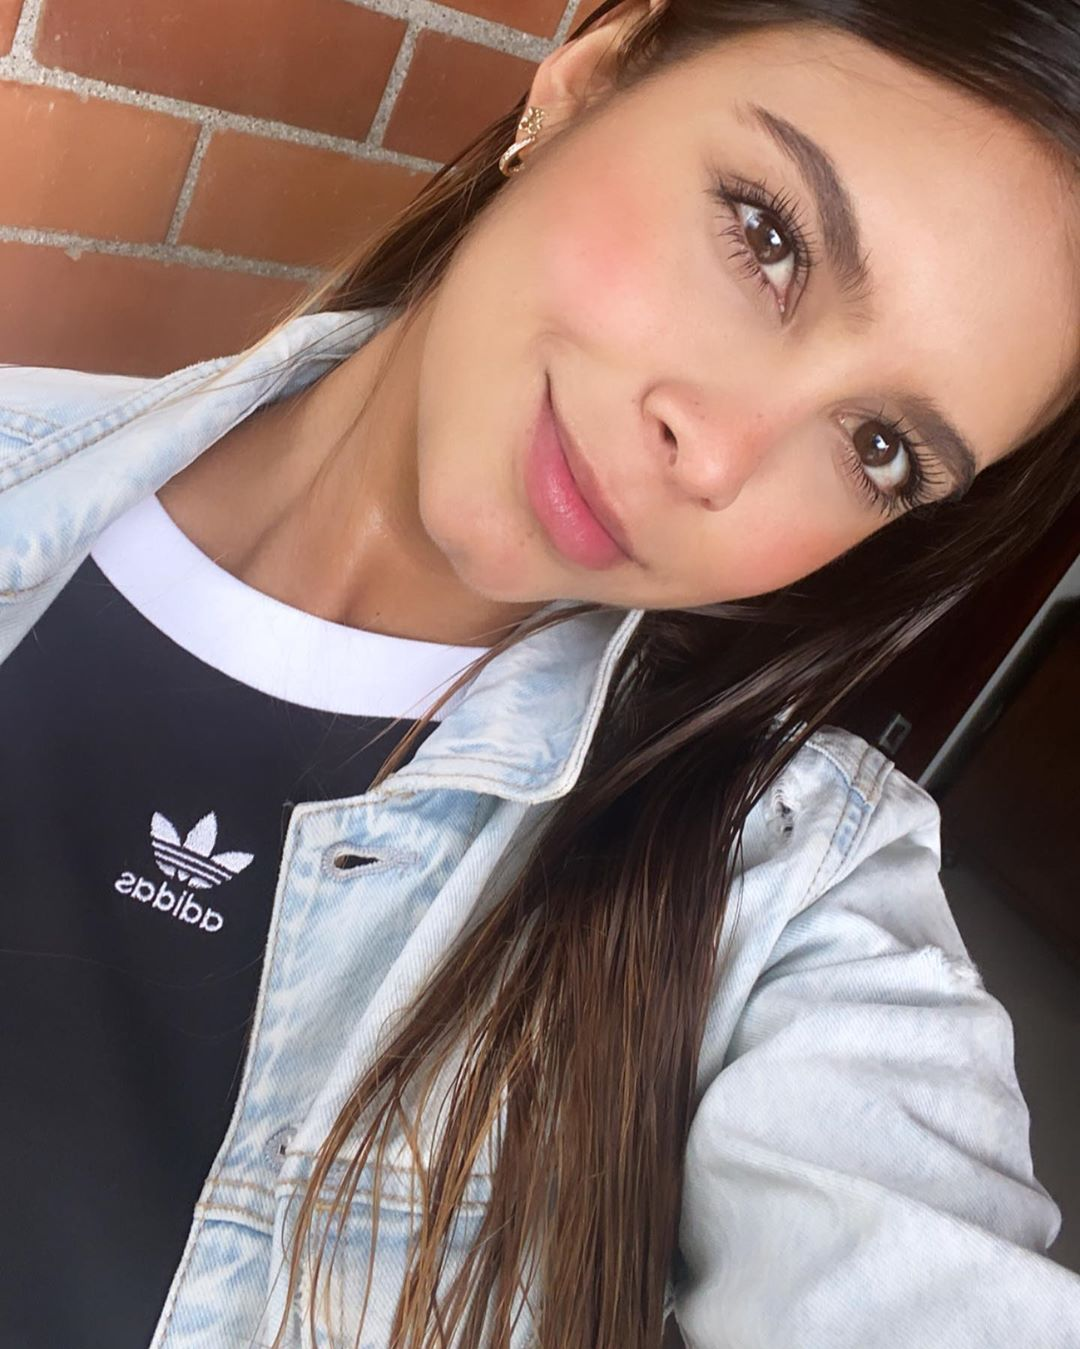 Daniela-Medina-Wallpapers-Insta-FIt-Bio-12